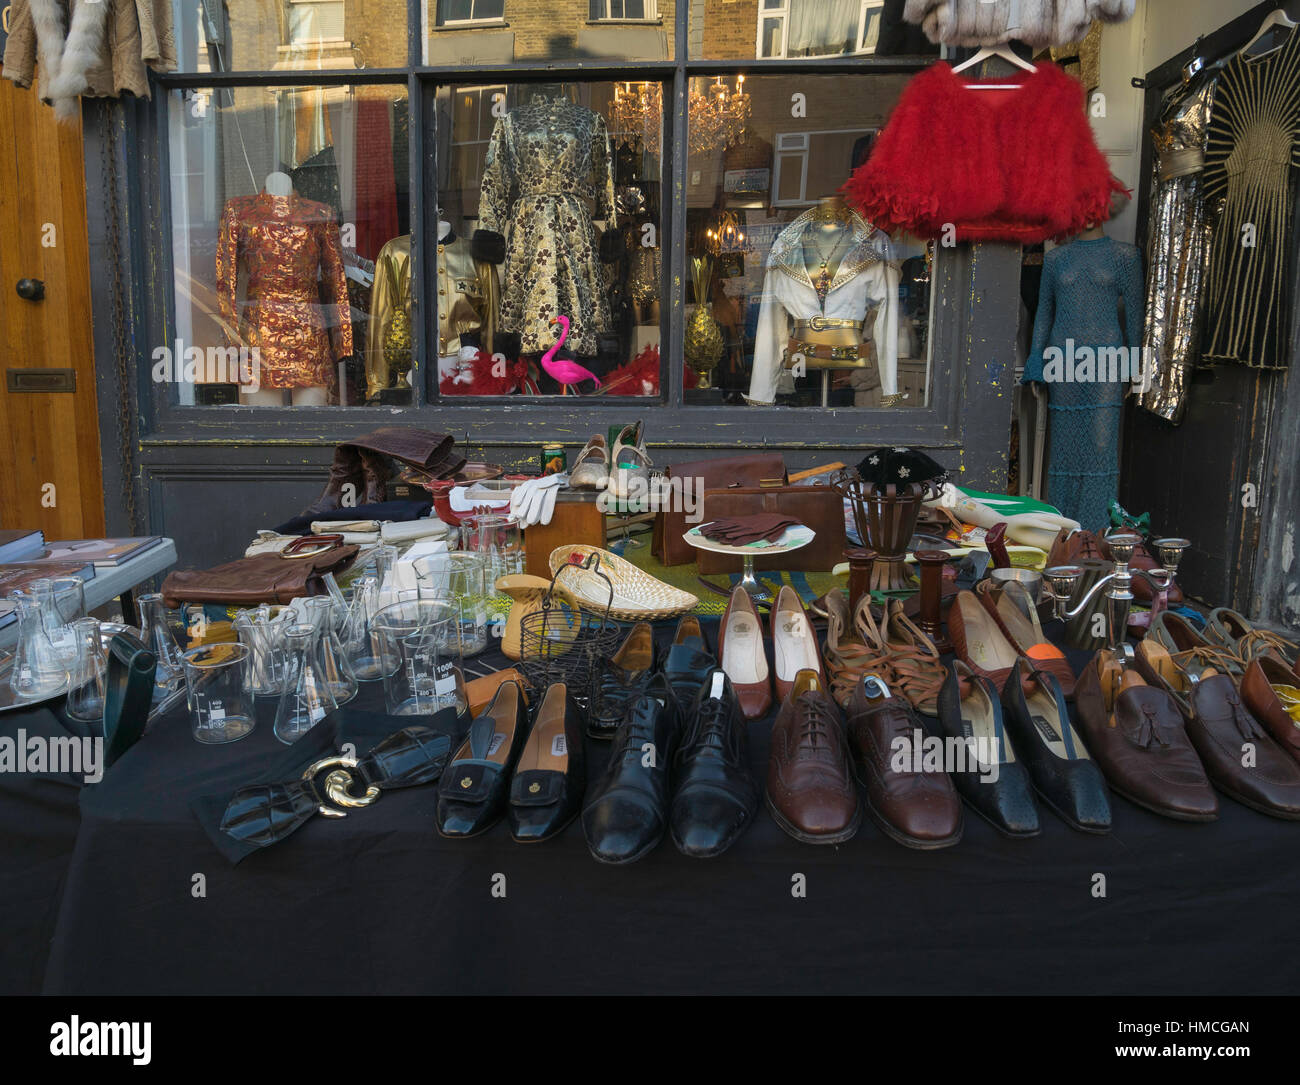 Vintage clothes shop, Portobello Road, Notting Hill, London, England,UK - Stock Image